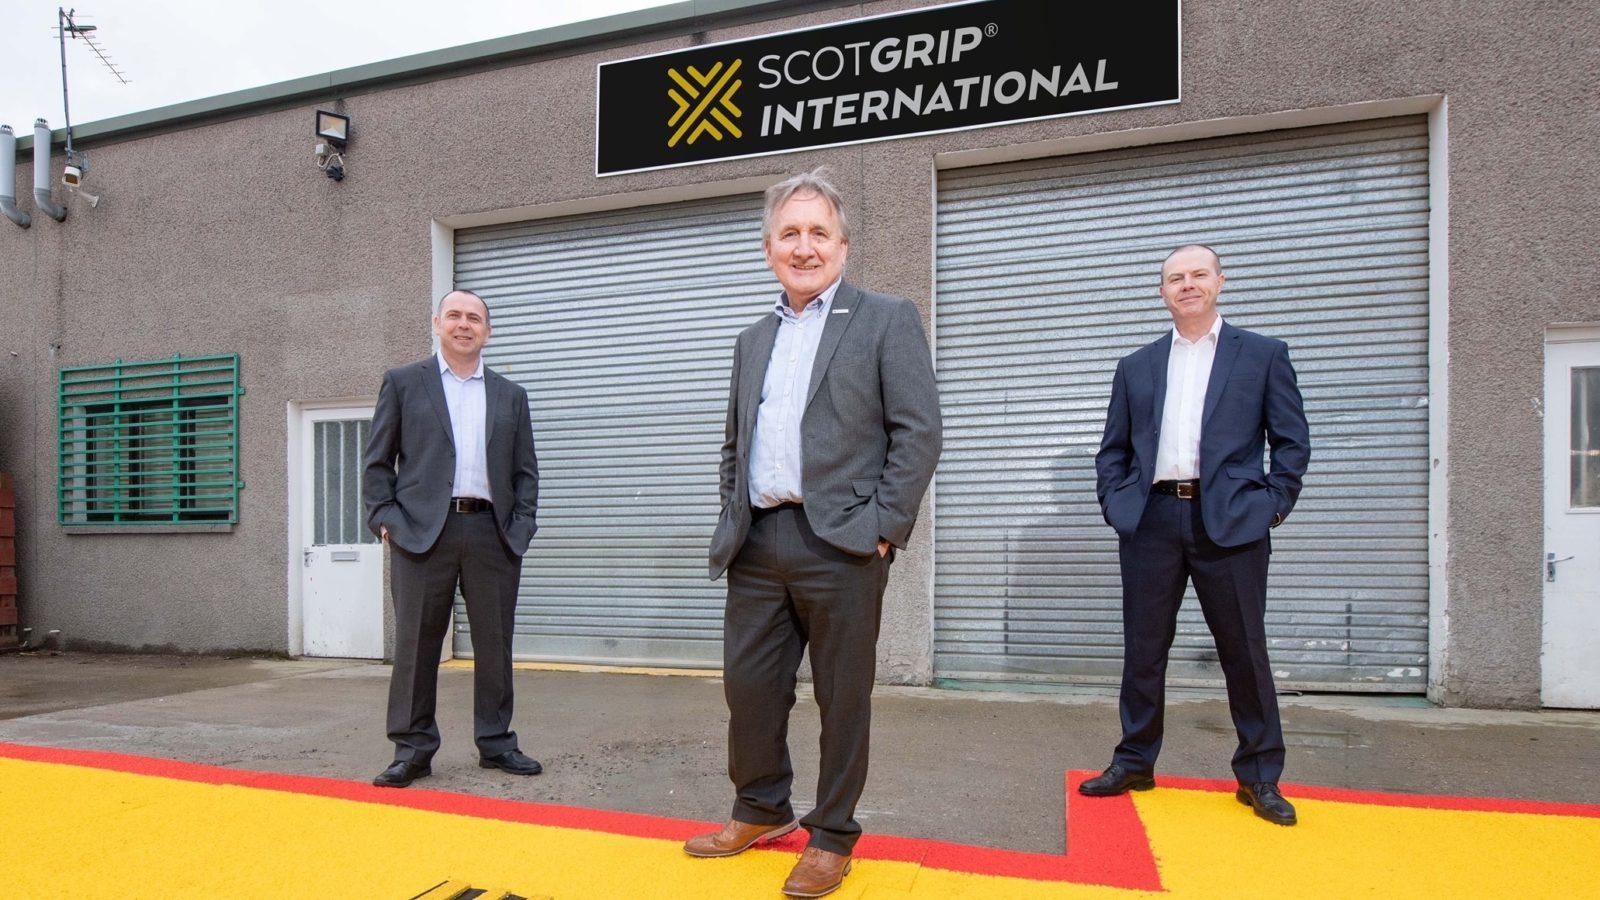 SCOTGRIP INTERNATIONAL® partners with Craig International